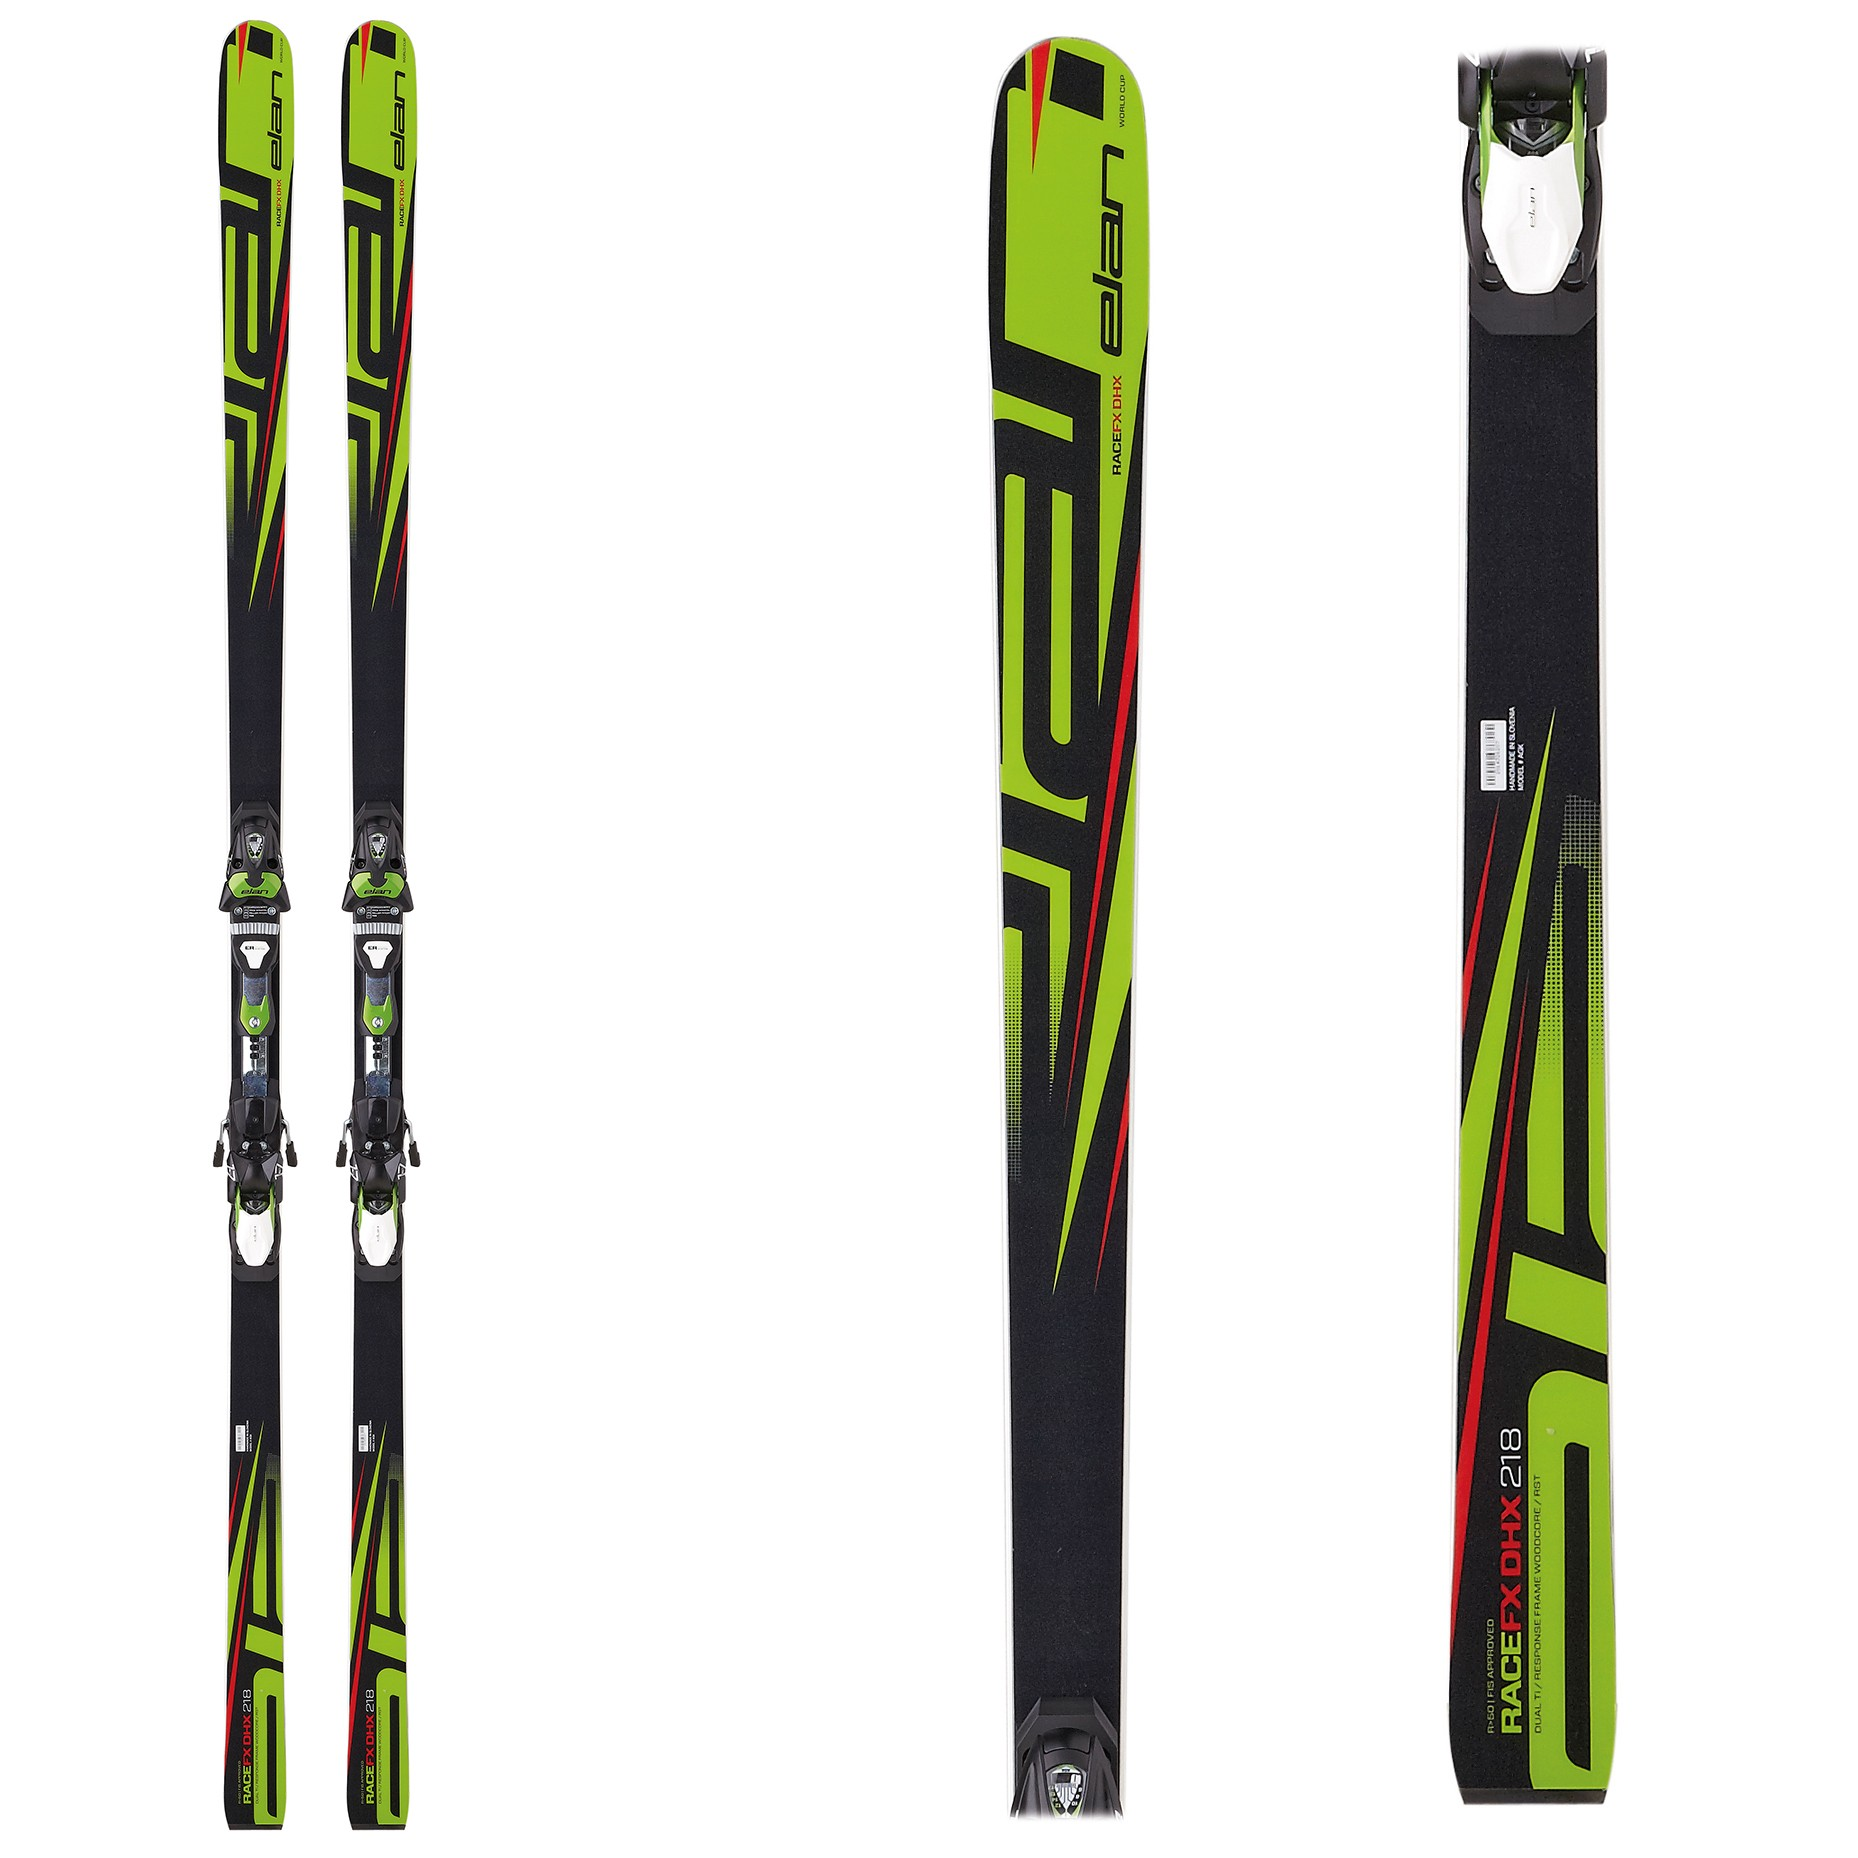 Elan Downhill skis - FX DHX Plate, FIS, 2016